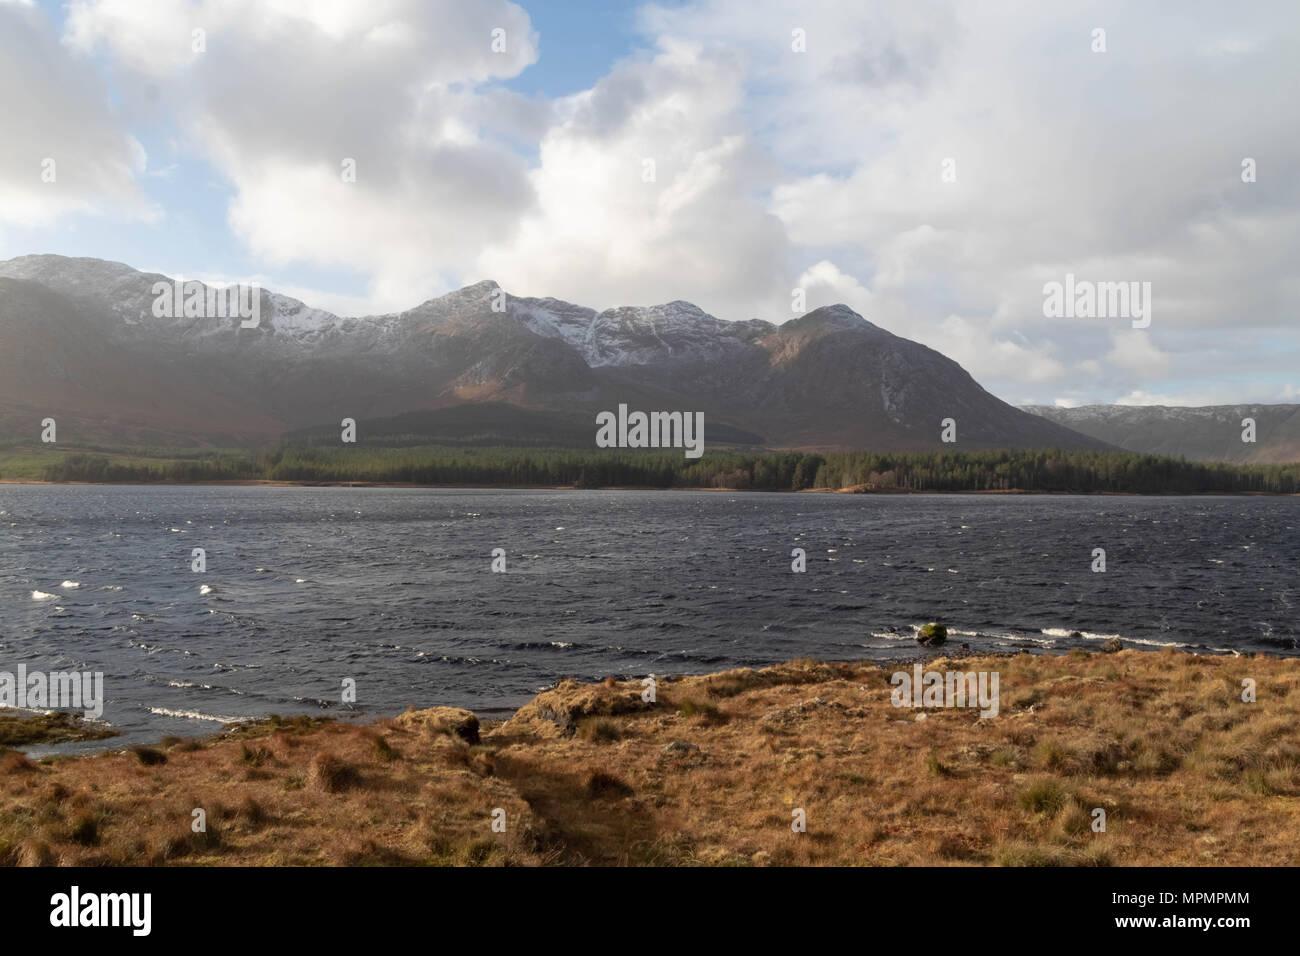 Connemara National Park Lake, West of Ireland, Connemara, Ireland - Stock Image